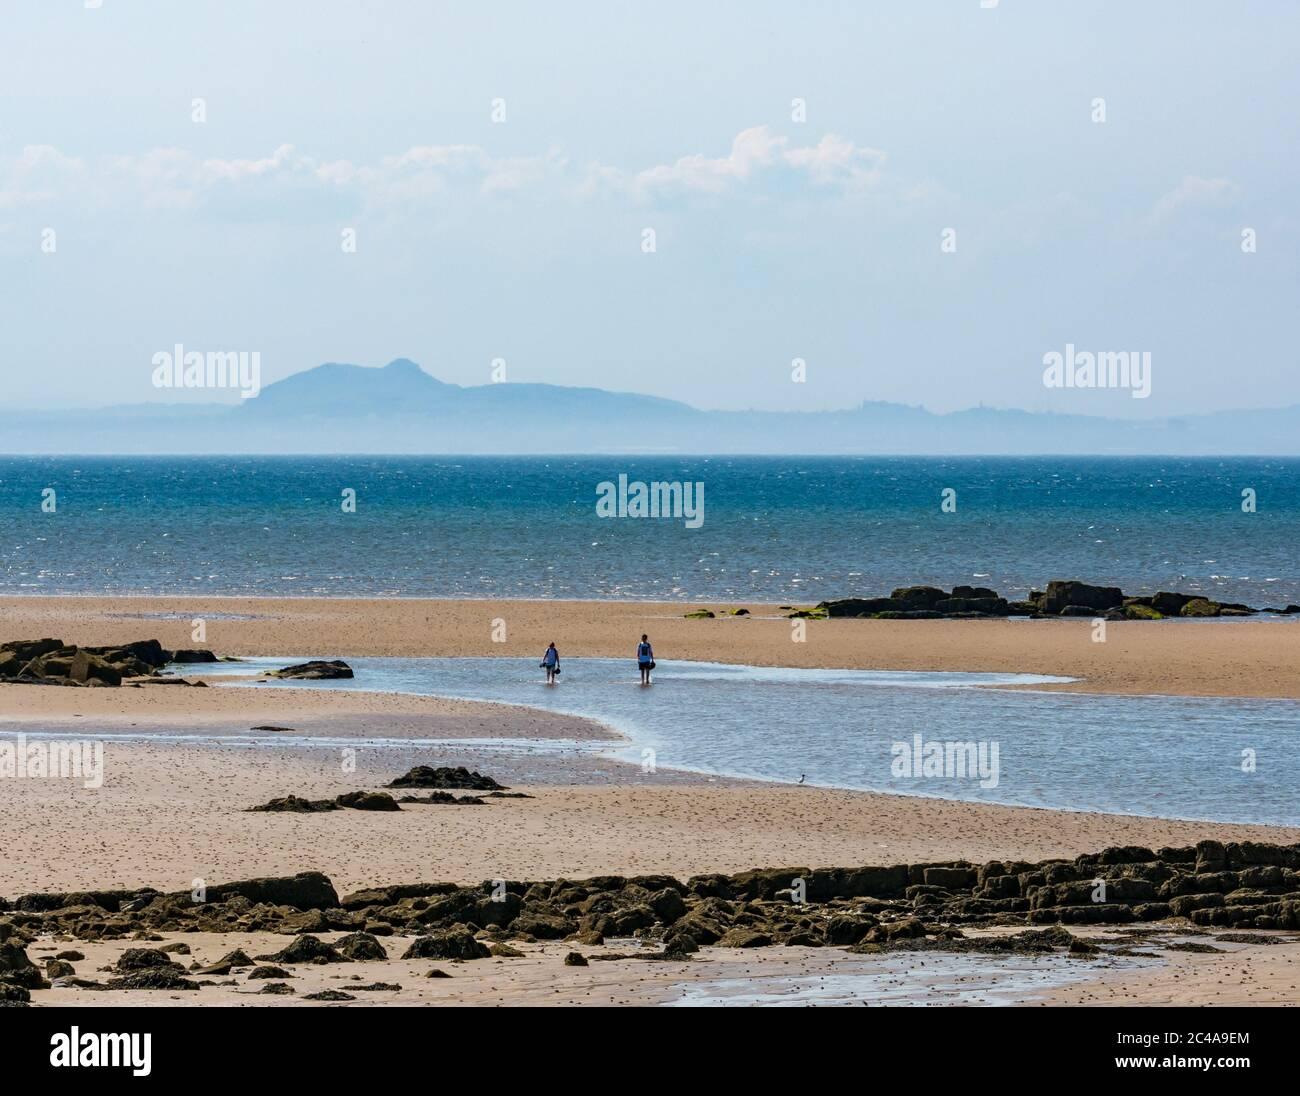 aberlady-east-lothian-scotland-united-ki